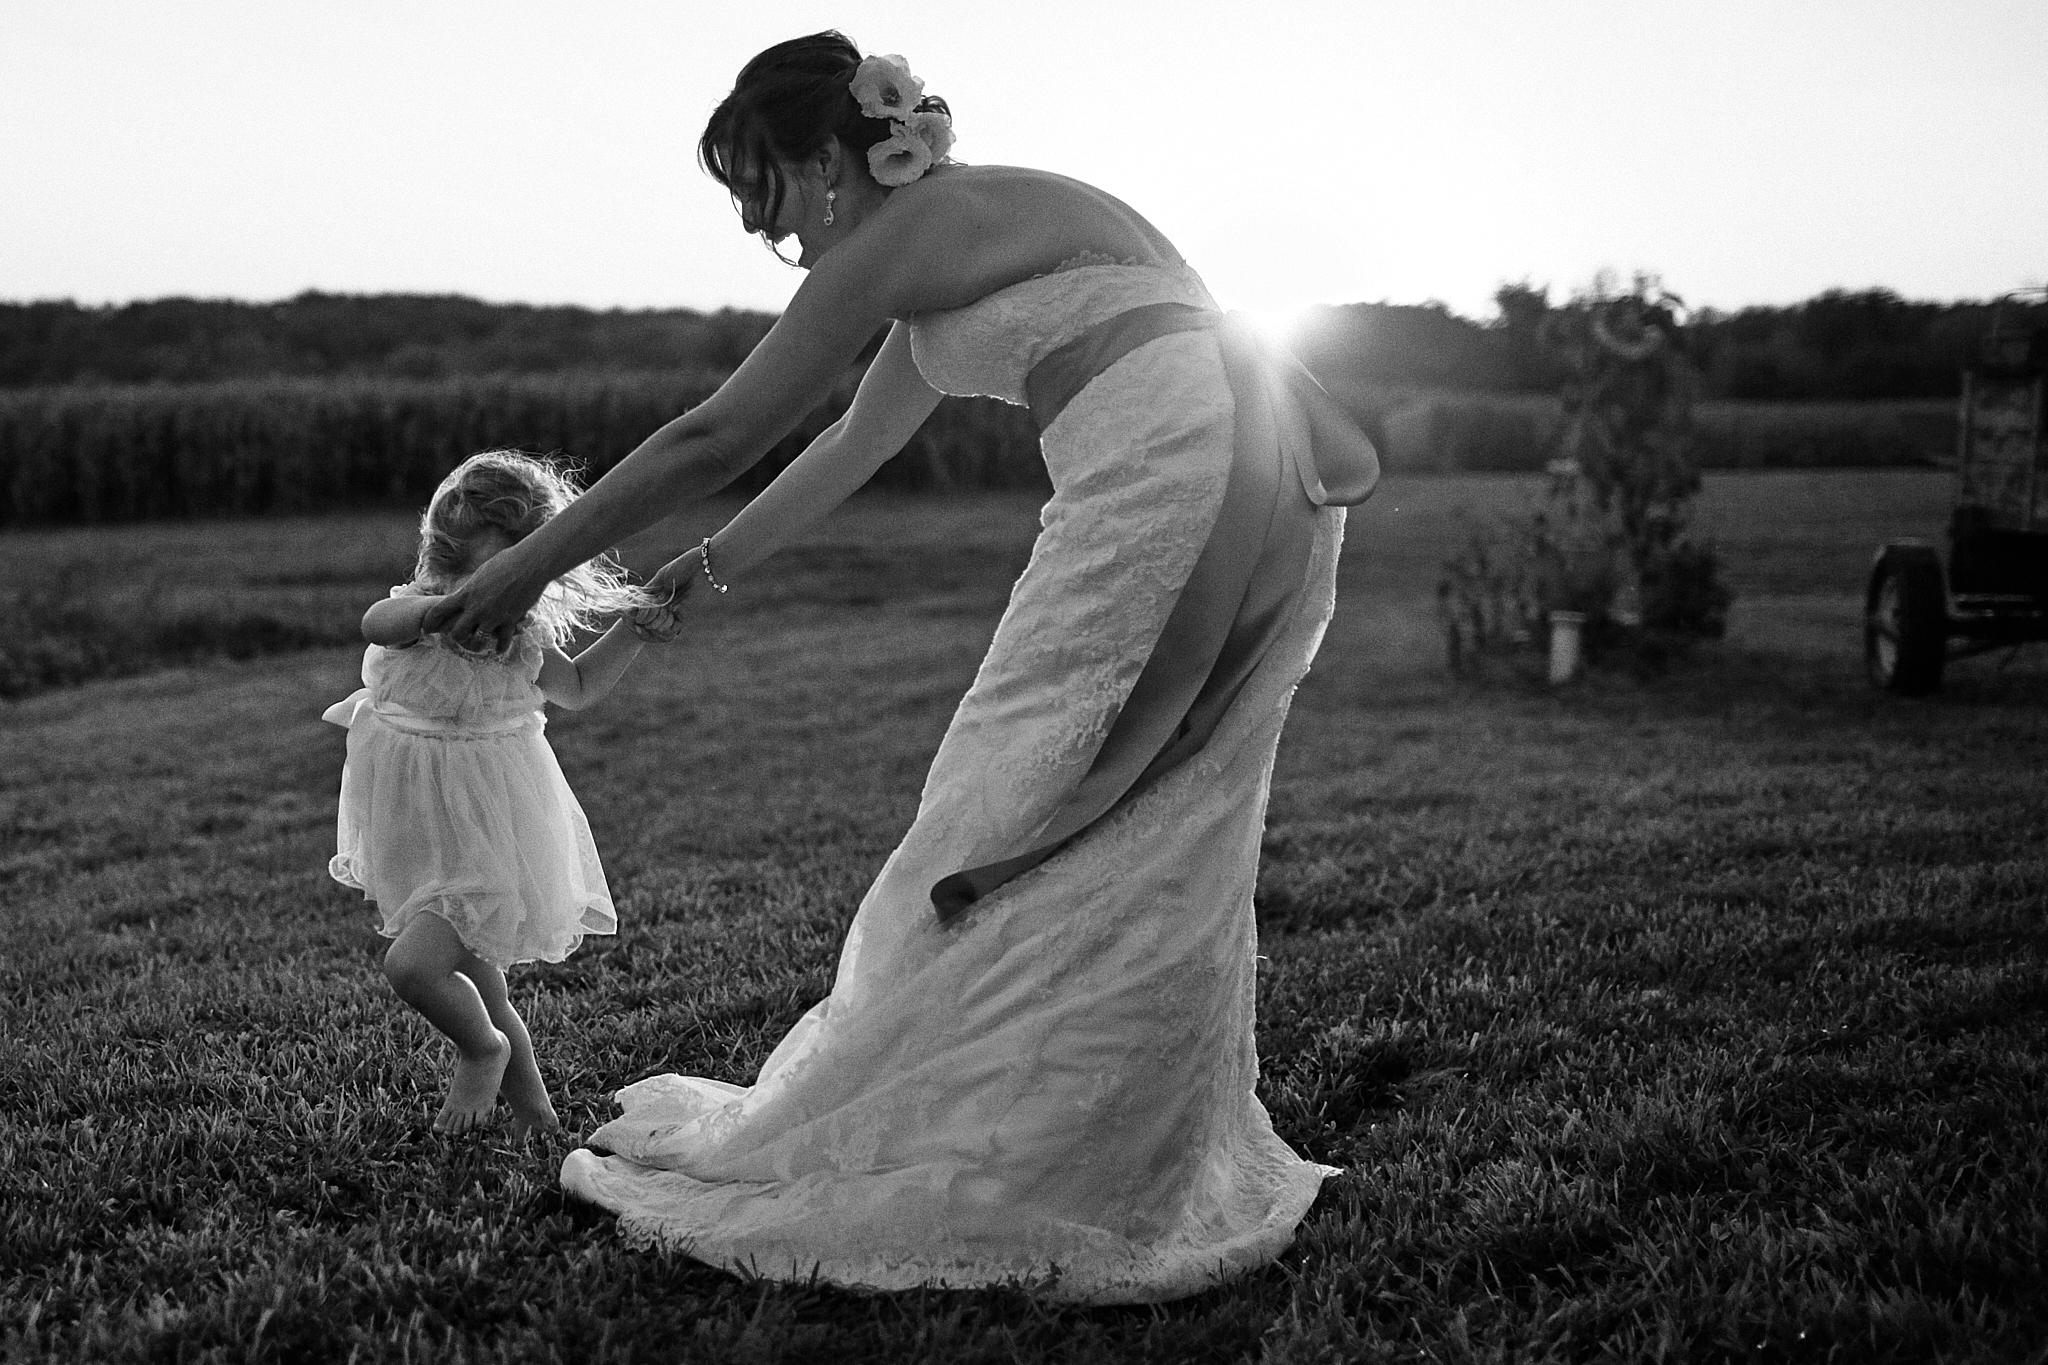 Jean_Acres_Barn_Wedding_Photography_High_End_Minneapolis_Brand_Photographer_Something_Candid_021.JPG